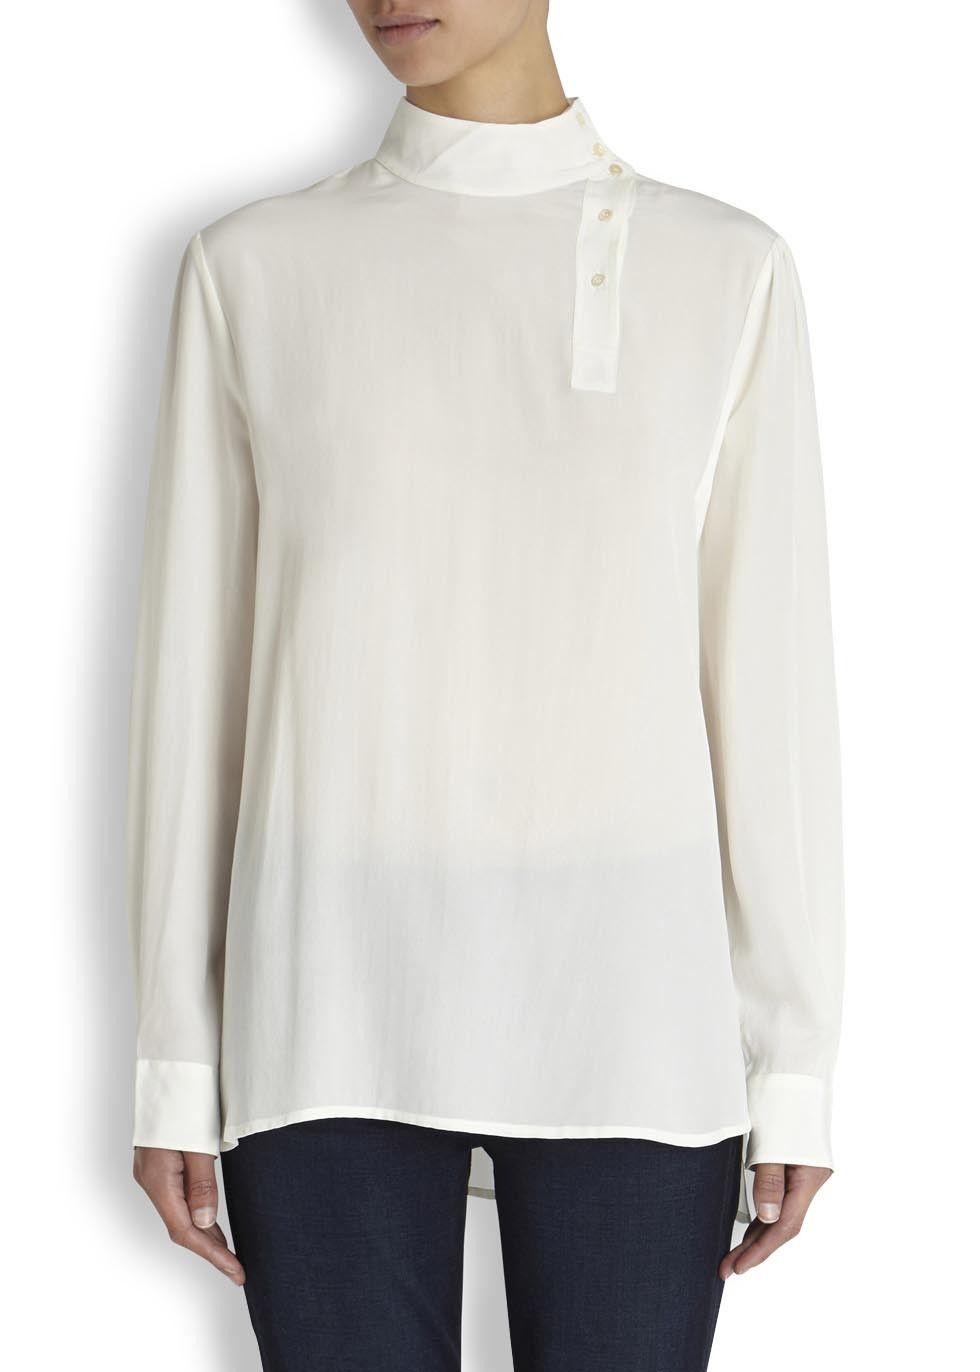 CURRENT/ELLIOTT X Charlotte Gainsbourg silk blouse